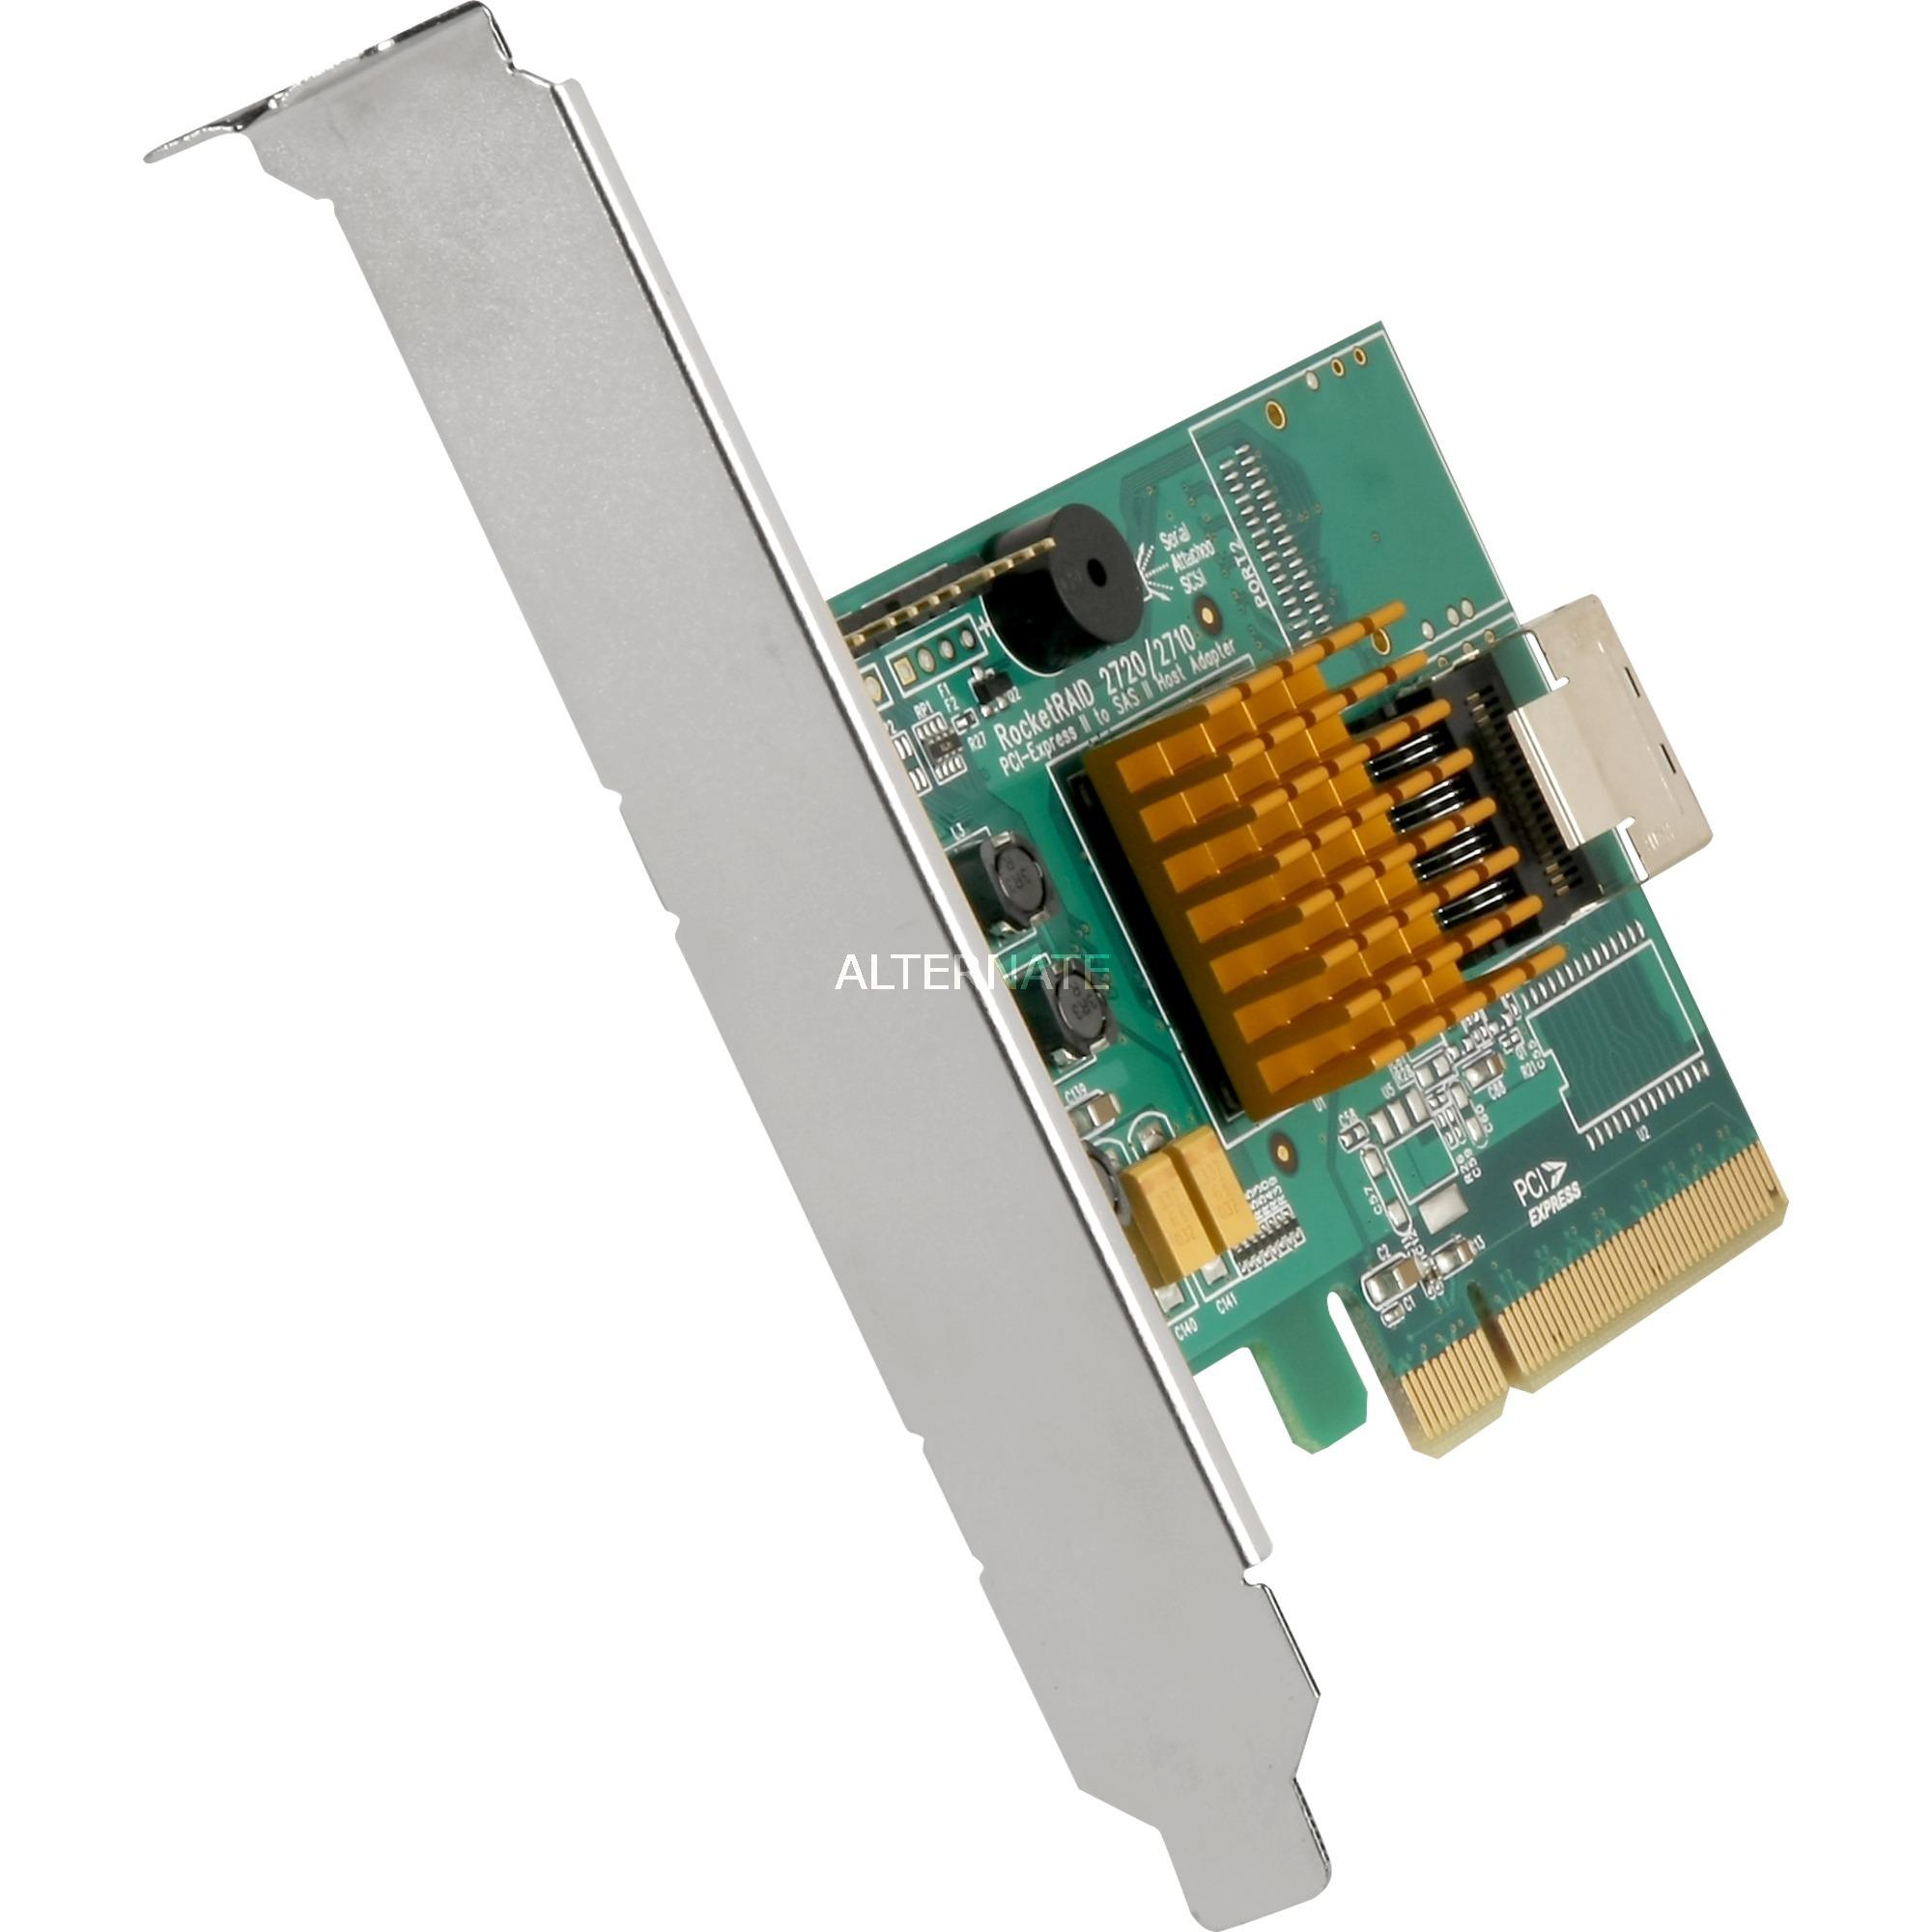 RocketRAID 2710 PCI Express x8 6Gbit/s controlado RAID, Controlador